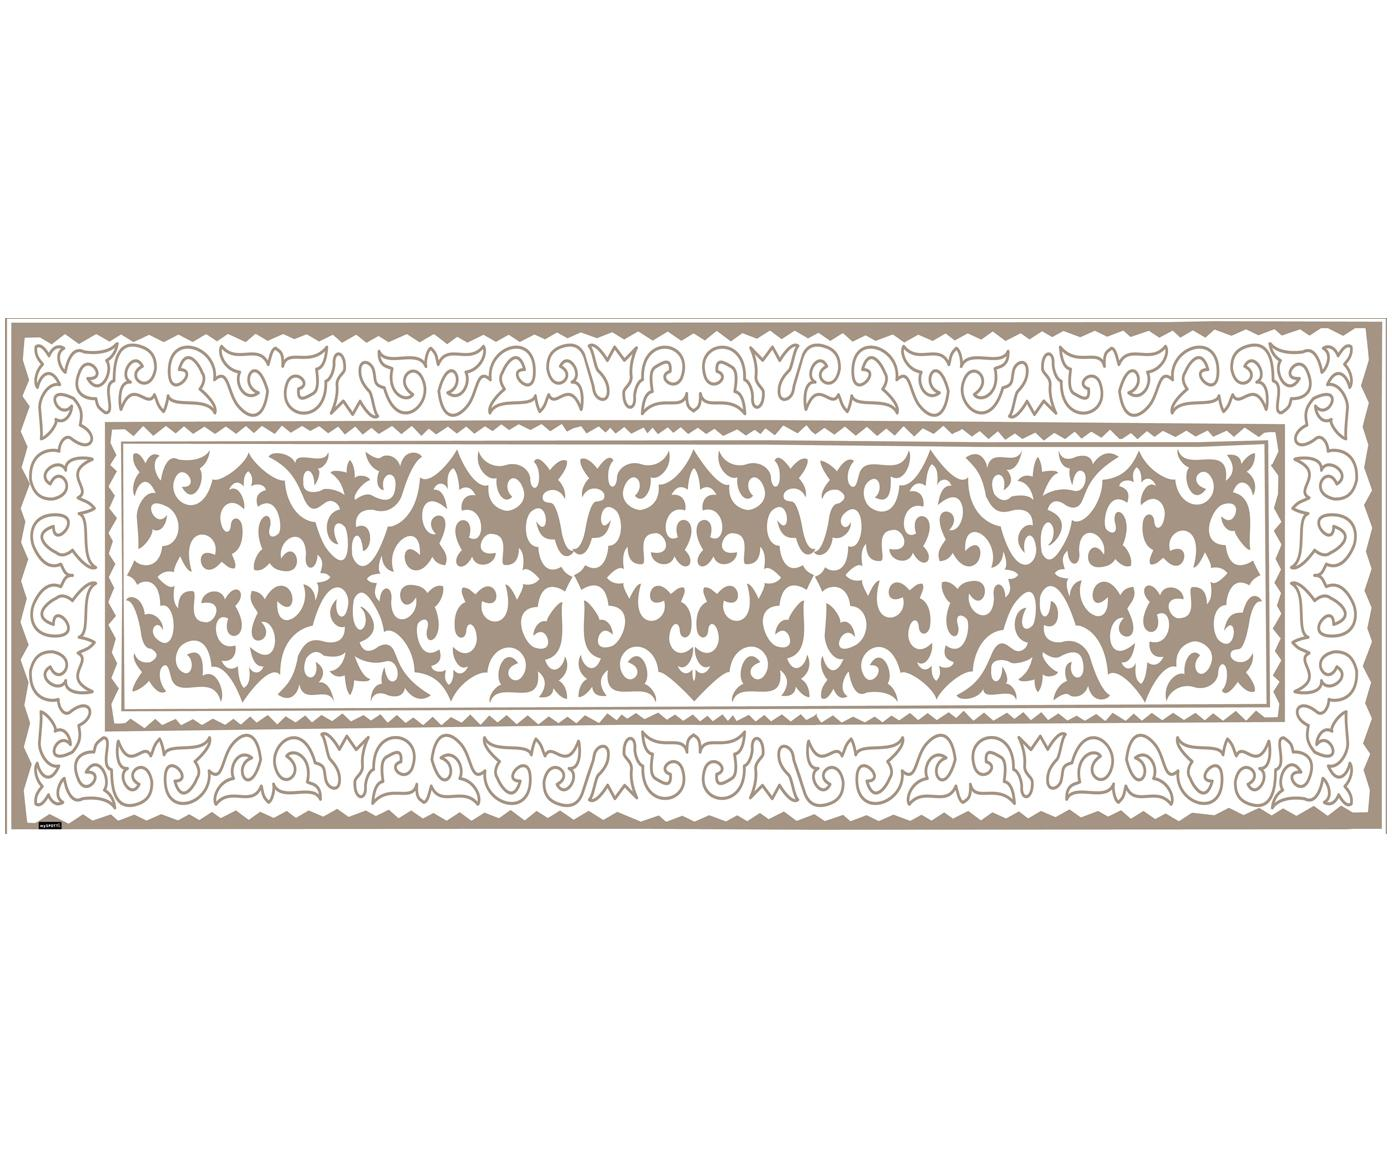 Tappetino in vinile Aksana, Vinile riciclabile, Taupe, bianco, Larg. 68 x Lung. 180 cm